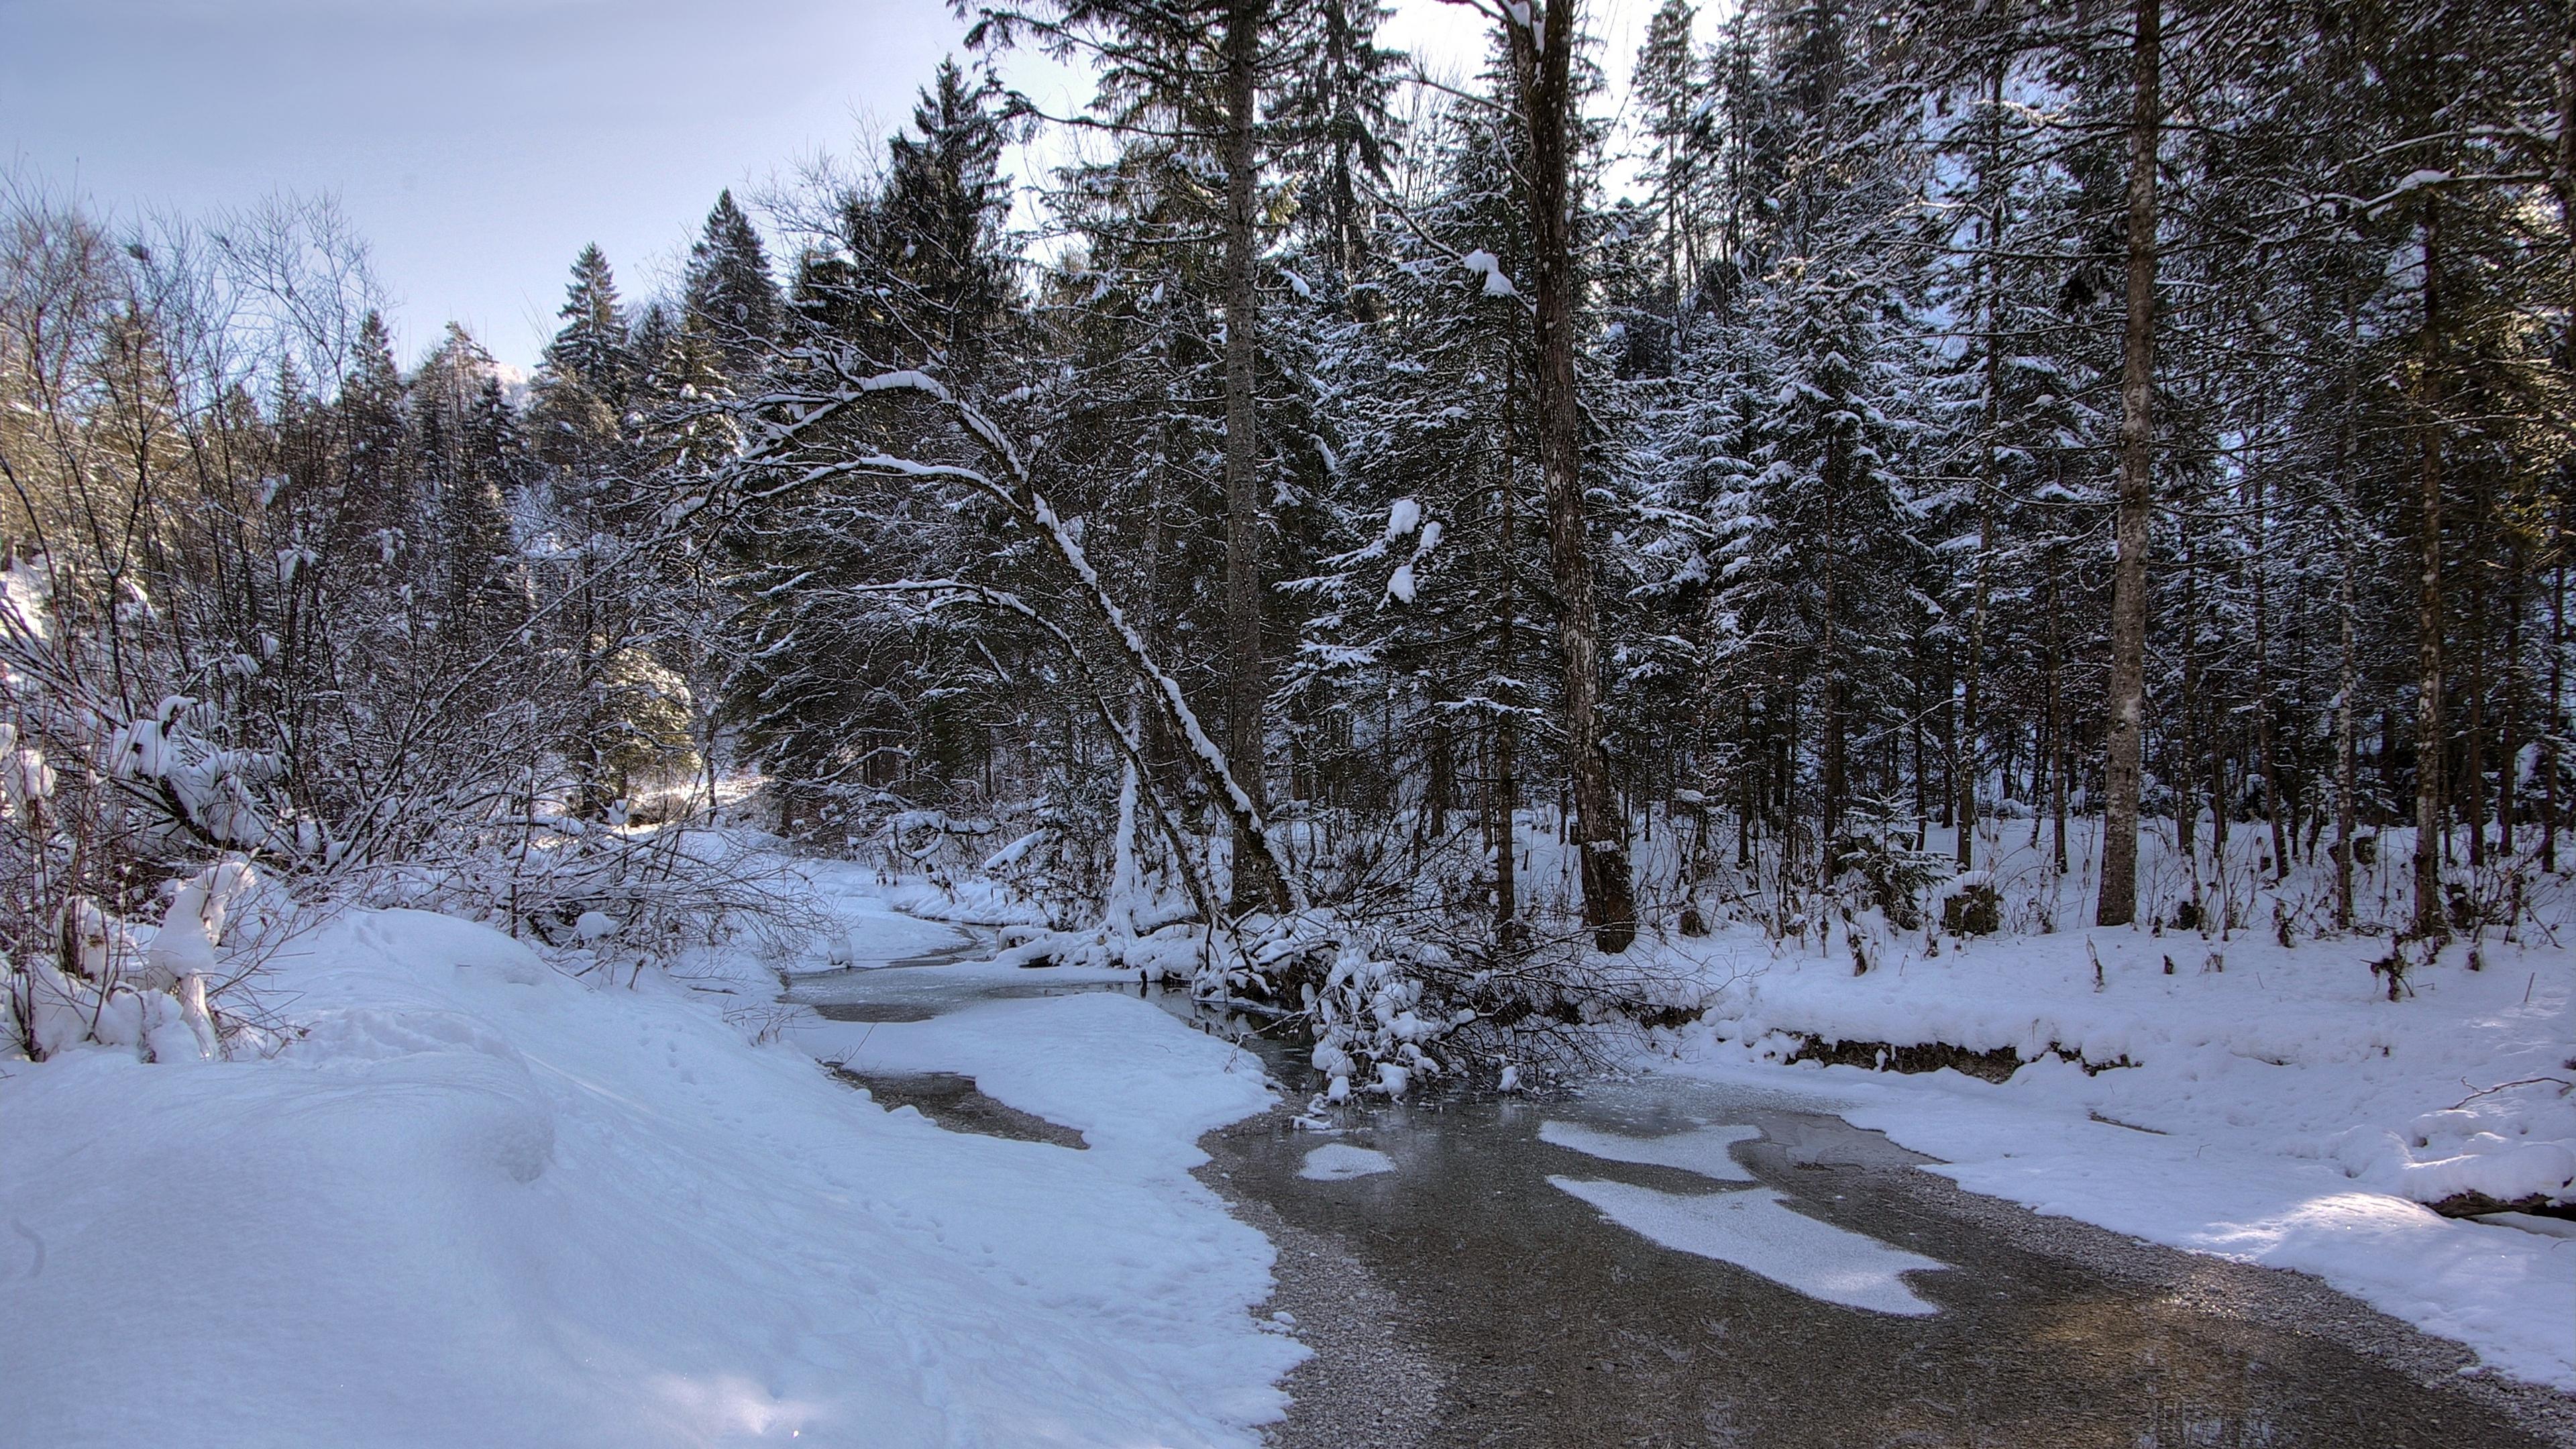 winter snow river forest landscape 4k 1541117539 - winter, snow, river, forest, landscape 4k - Winter, Snow, River